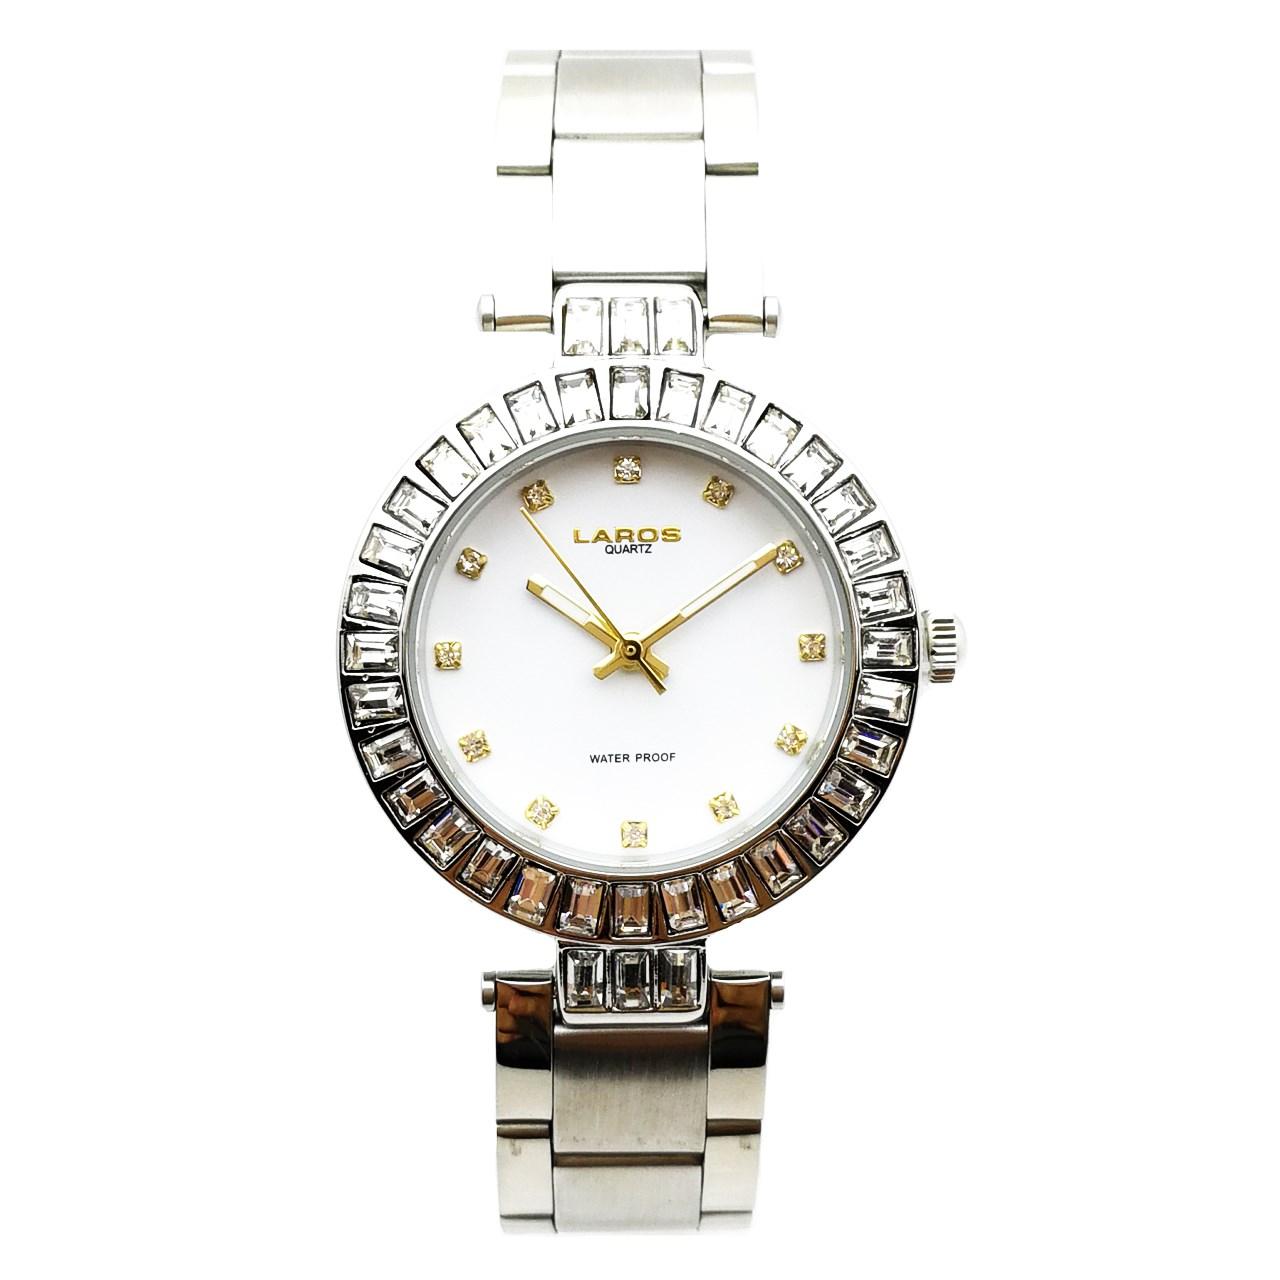 ساعت مچی عقربه ای زنانه لاروس مدل LW-A109-Silver